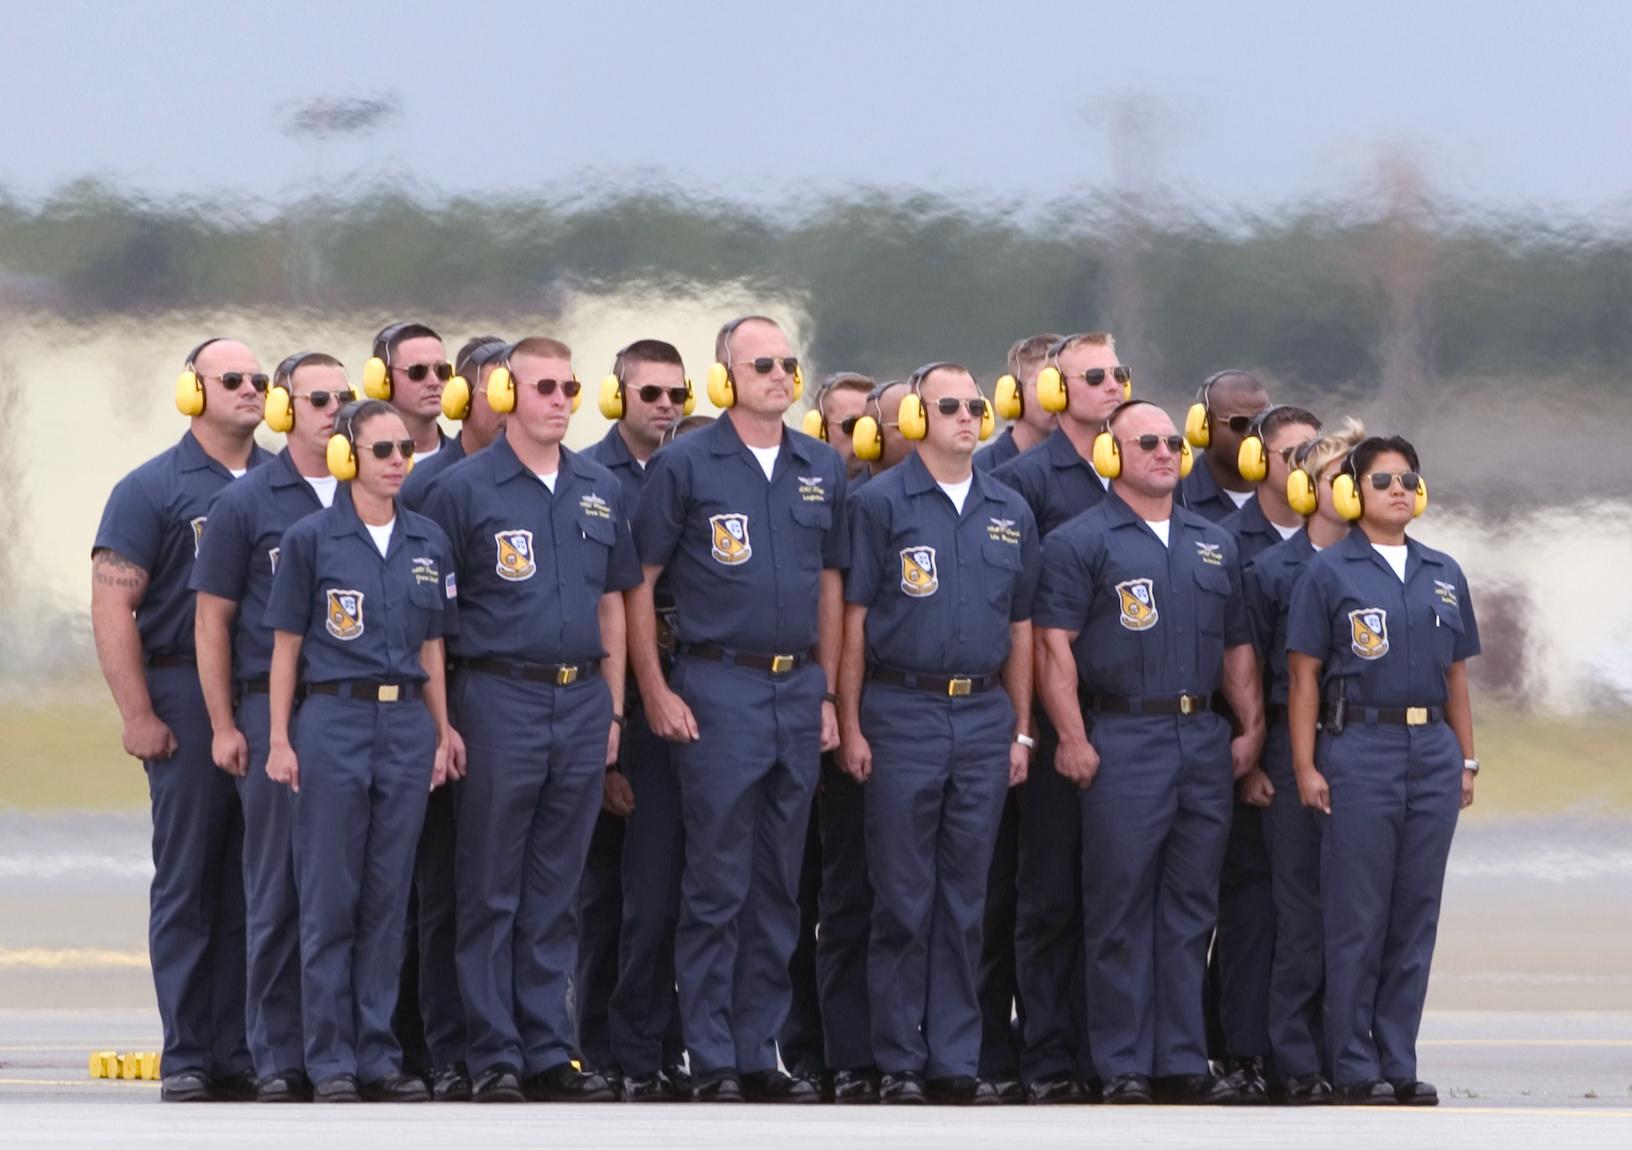 U.S. Navy Blue Angels flight team ground crew members « txphotoblog